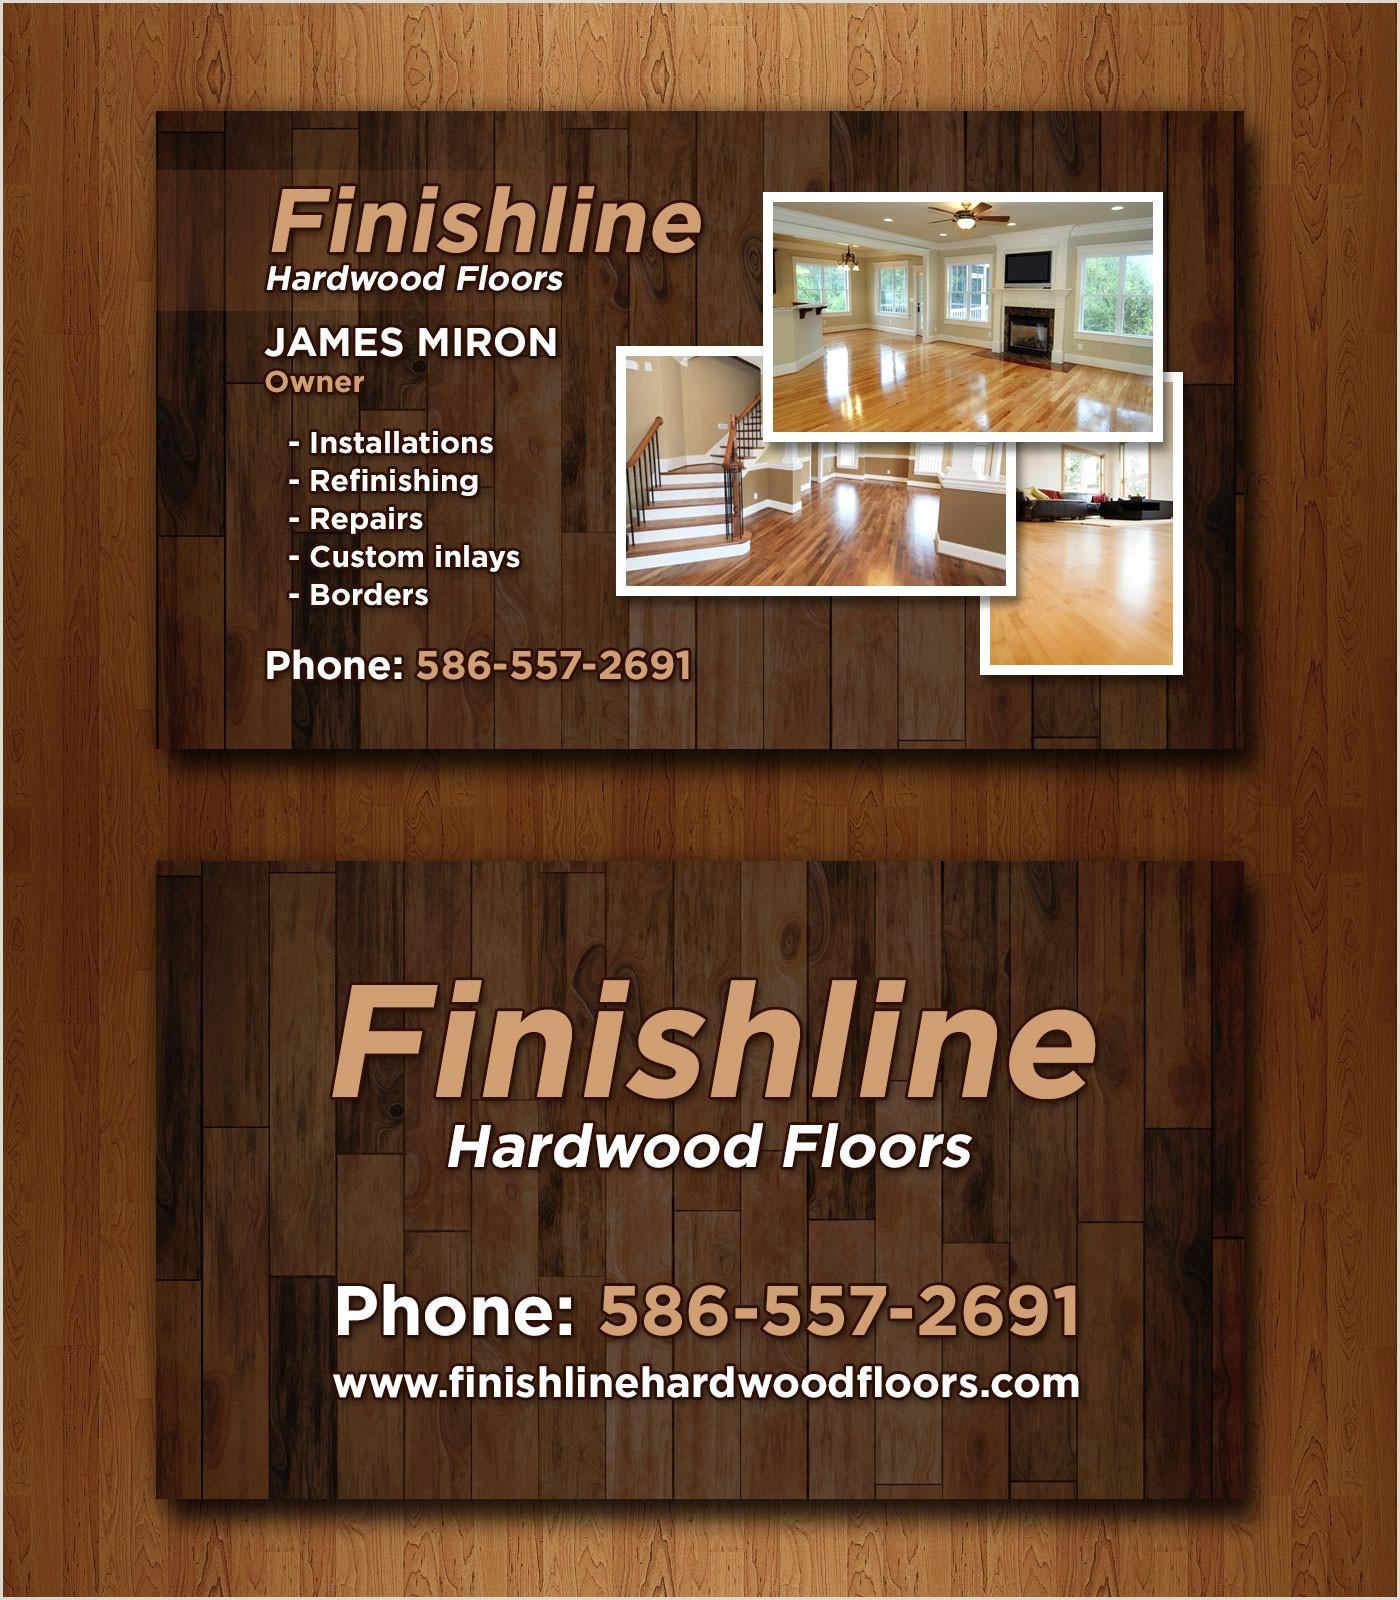 Printing Business Card 14 Popular Hardwood Flooring Business Card Template